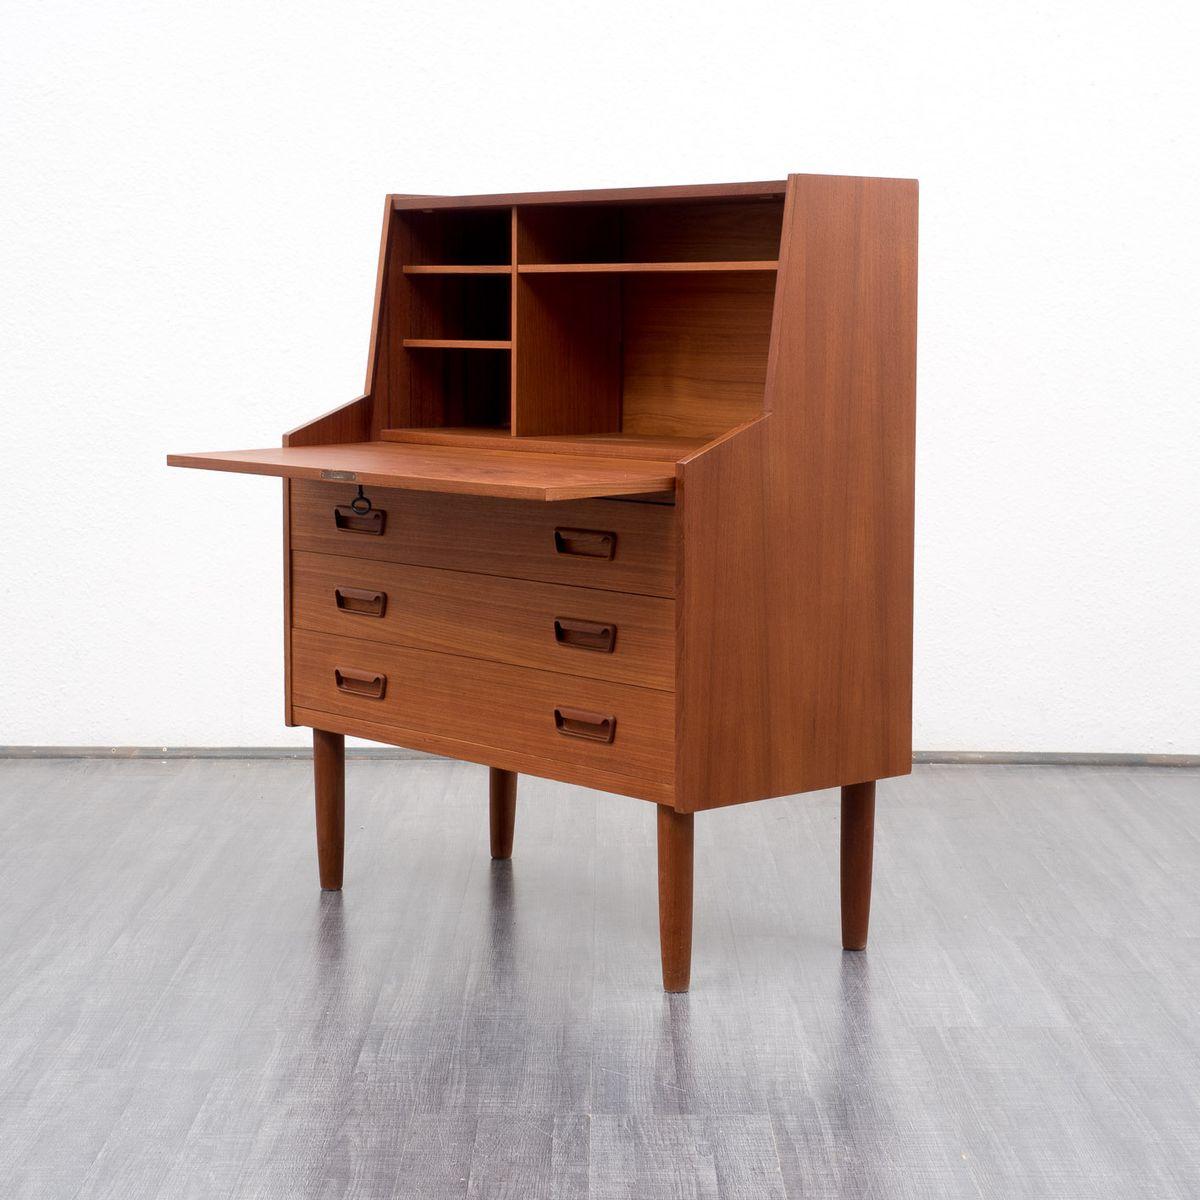 vintage scandinavian style teak secretaire for sale at pamono. Black Bedroom Furniture Sets. Home Design Ideas